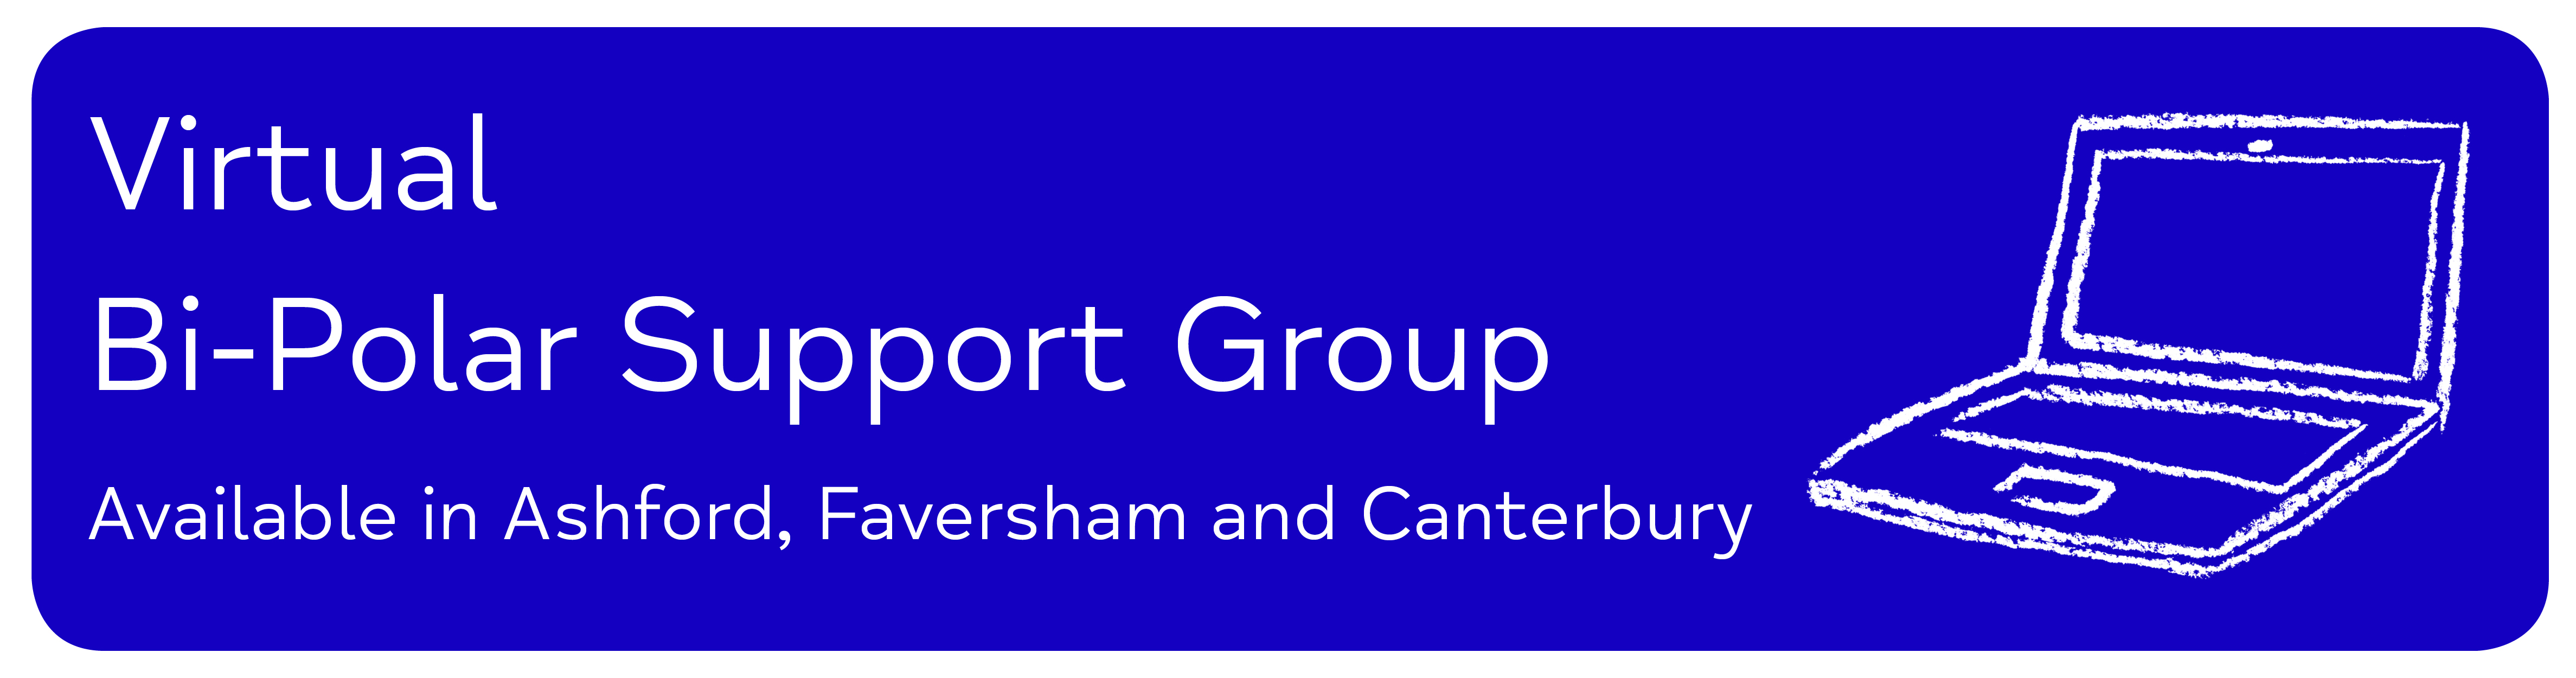 Virtual Bi-Polar Support Group Available in Ashford, Faversham and Canterbury